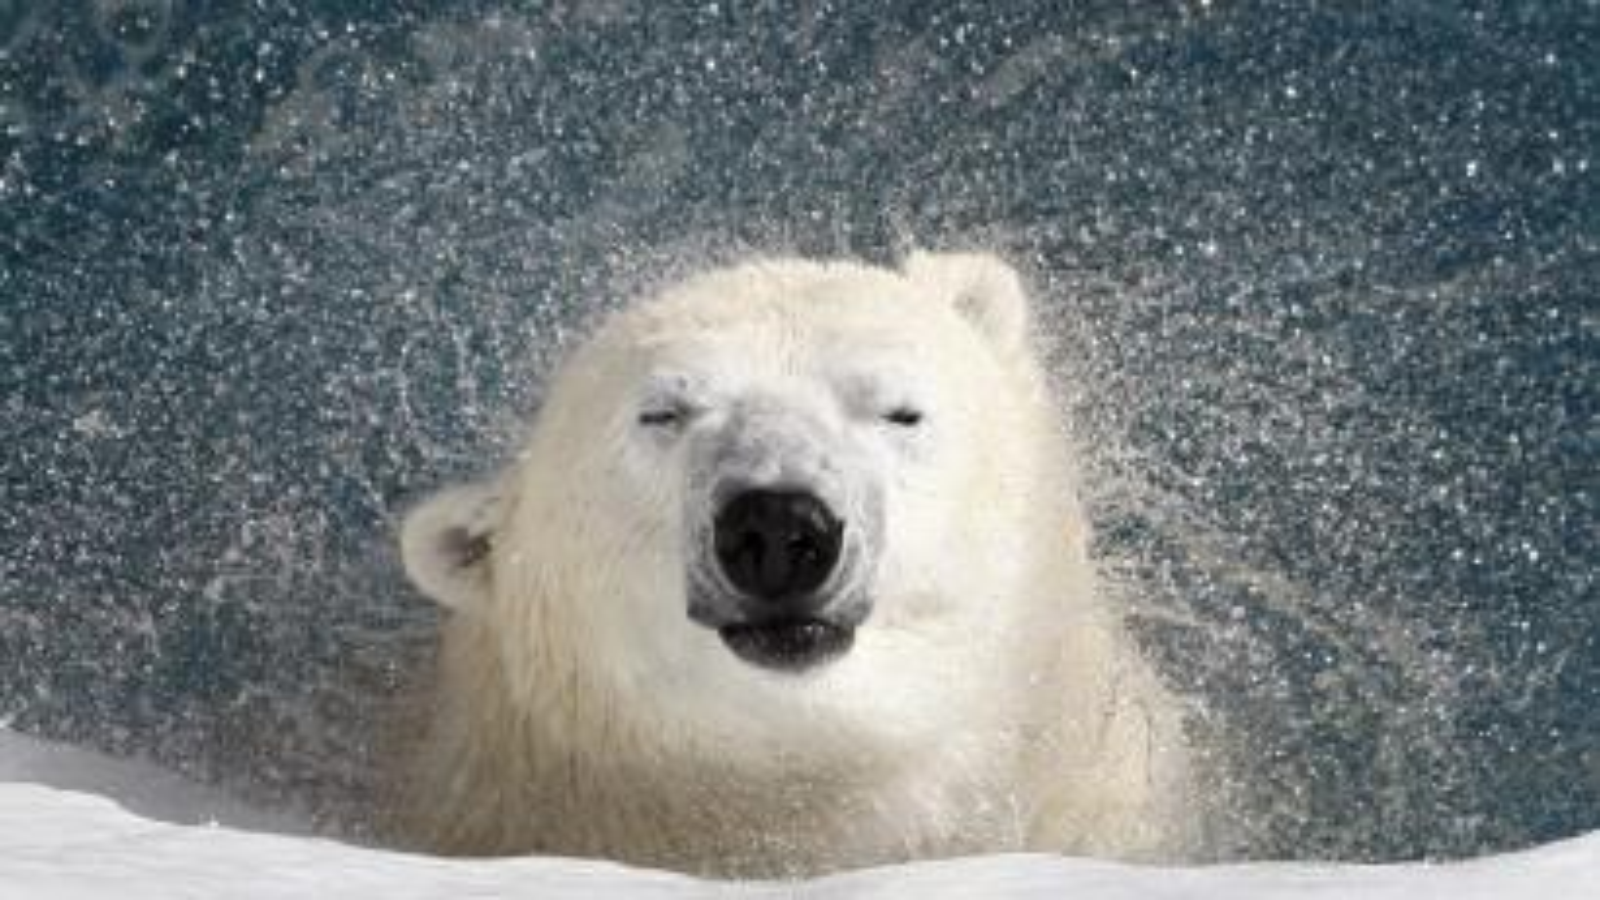 Polar bear shaking itself.